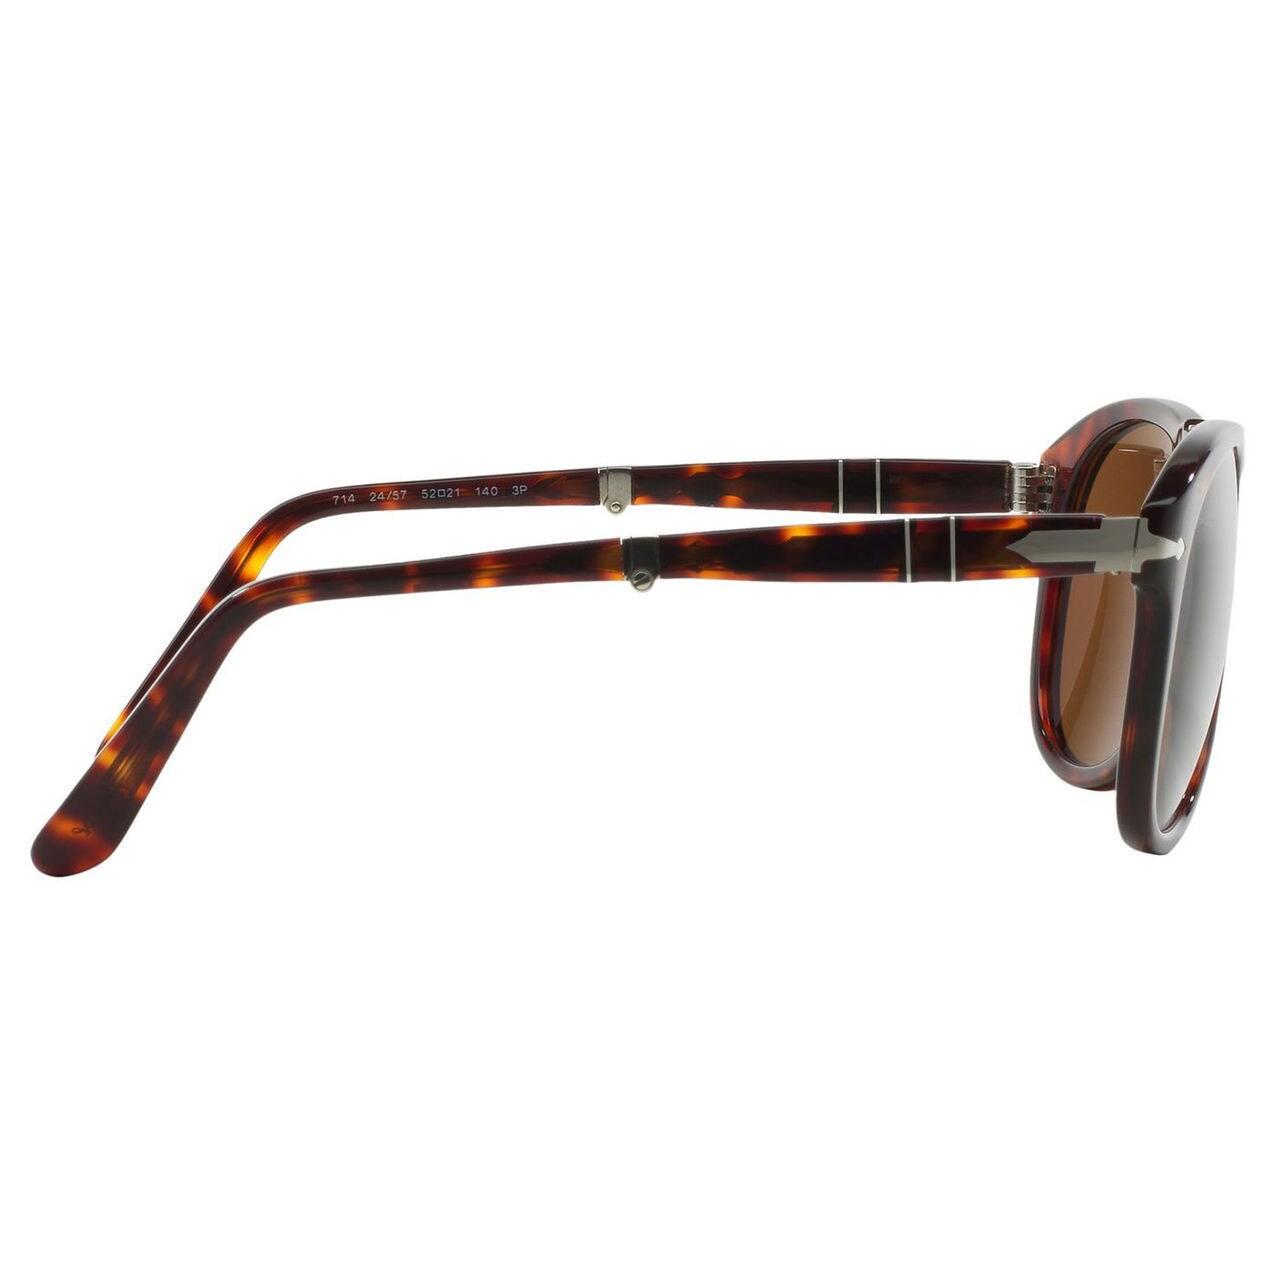 afac37786b97 Persol Folding Sunglasses Price « One More Soul